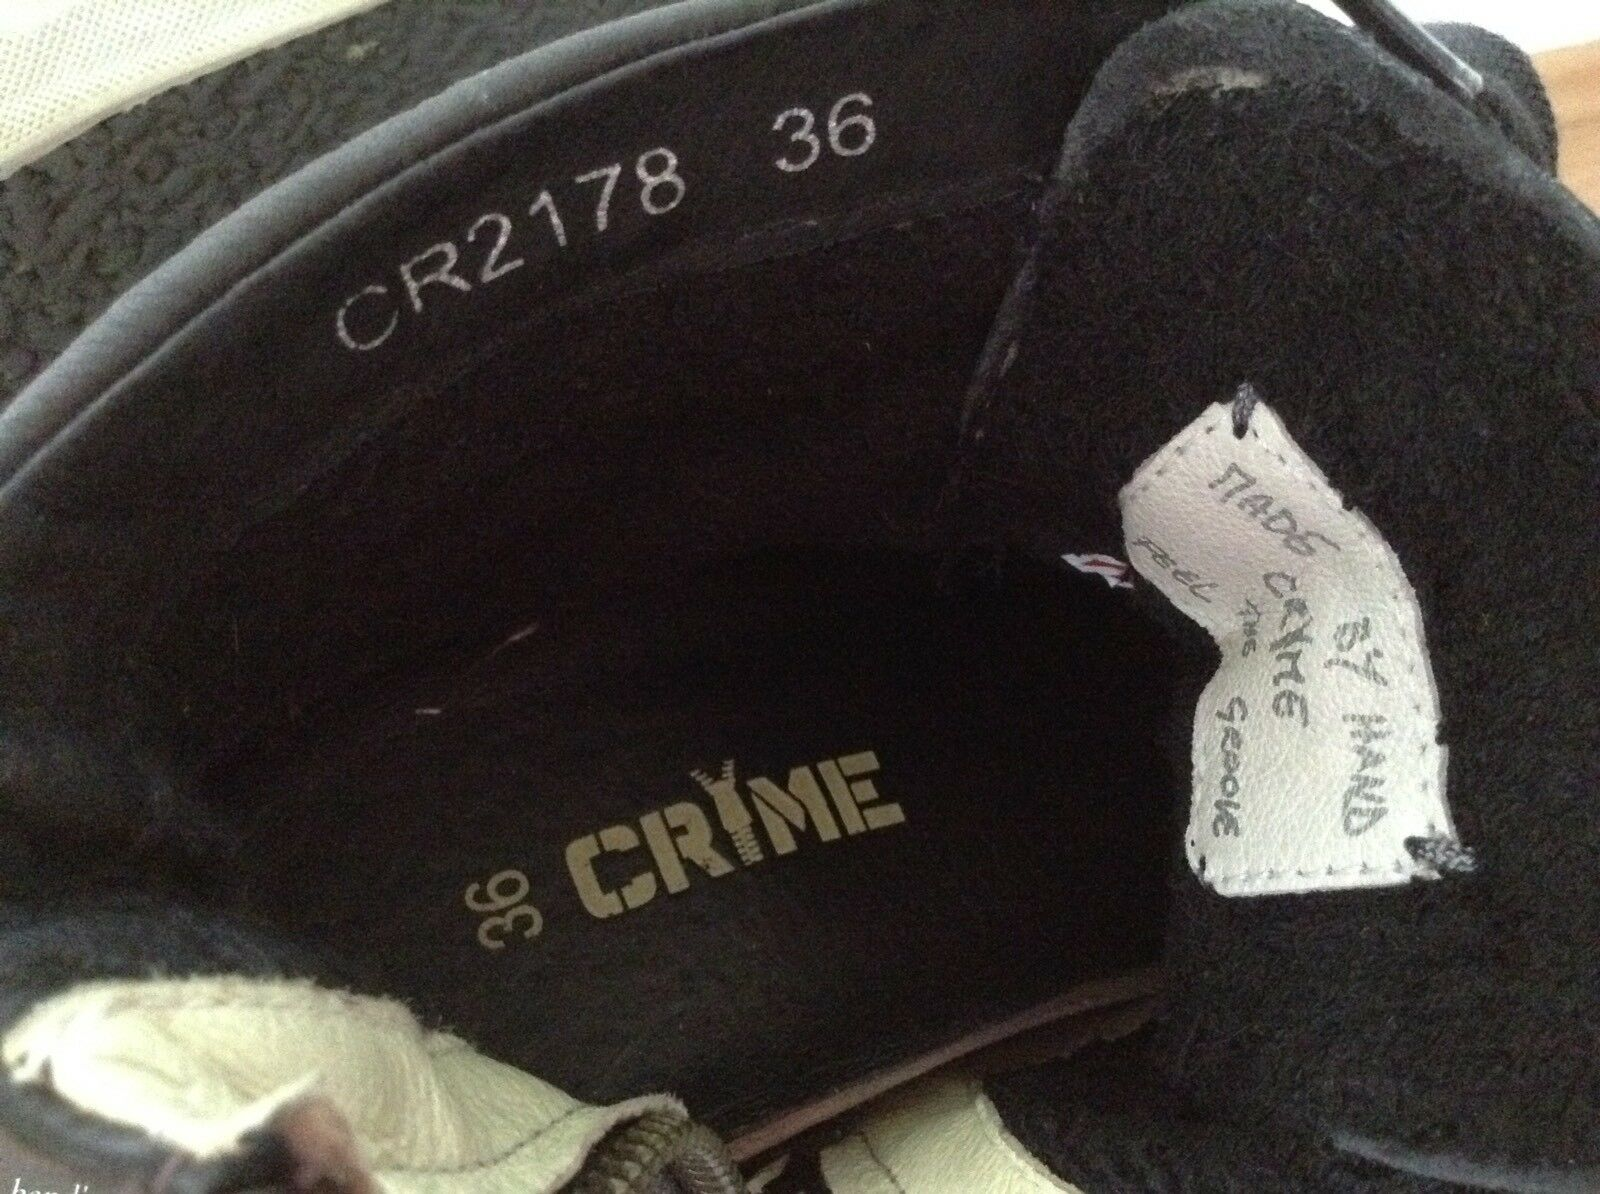 Damen Sneaker  von Crime London Lederschuh Gr. 36 Neuwertig  NP  Lederschuh London Metallic 3b6cb1